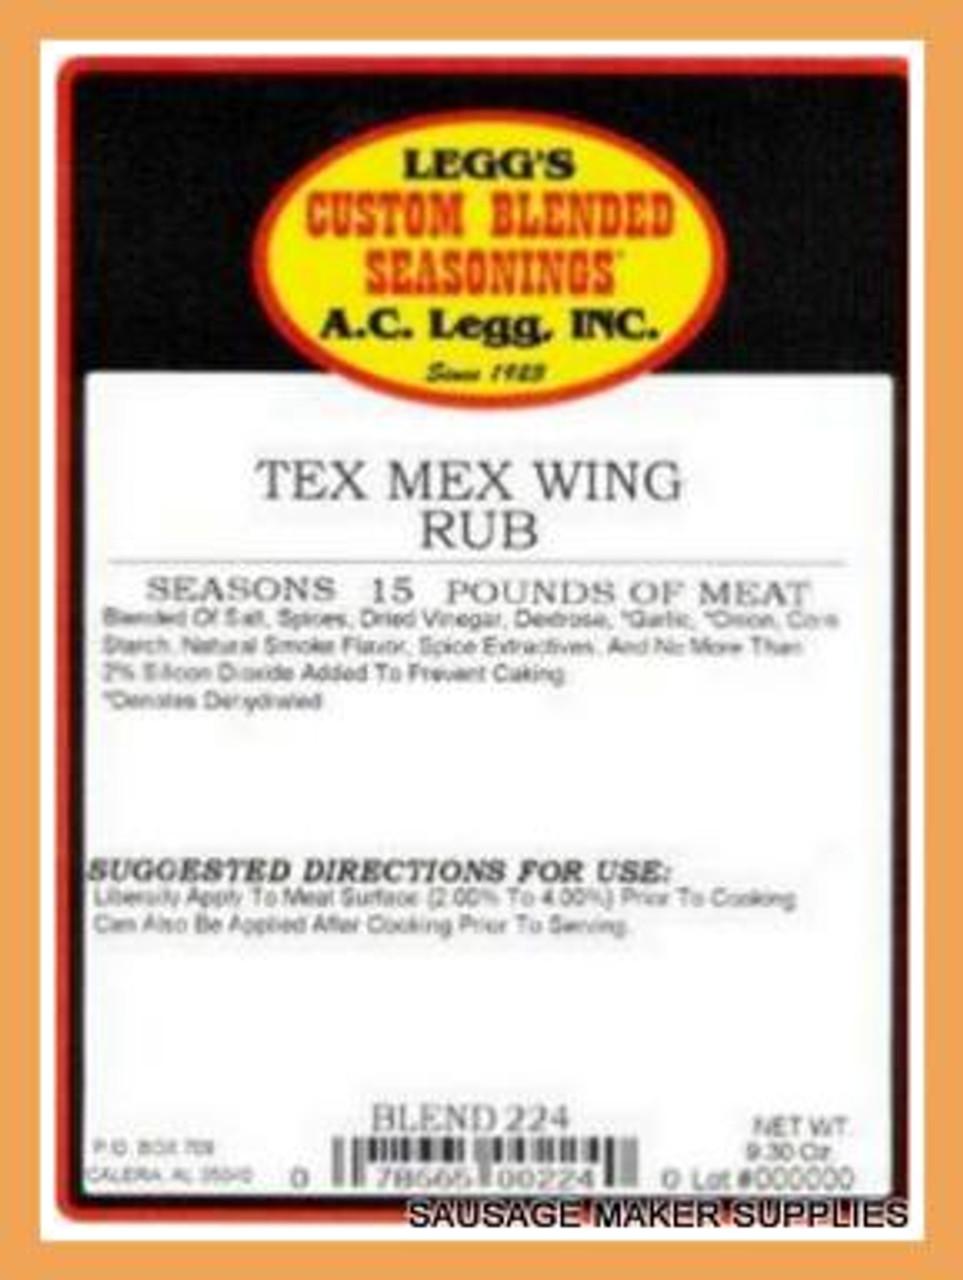 AC LEGG OLD PLANTATION TEX MEX WING RUB BLEND 224